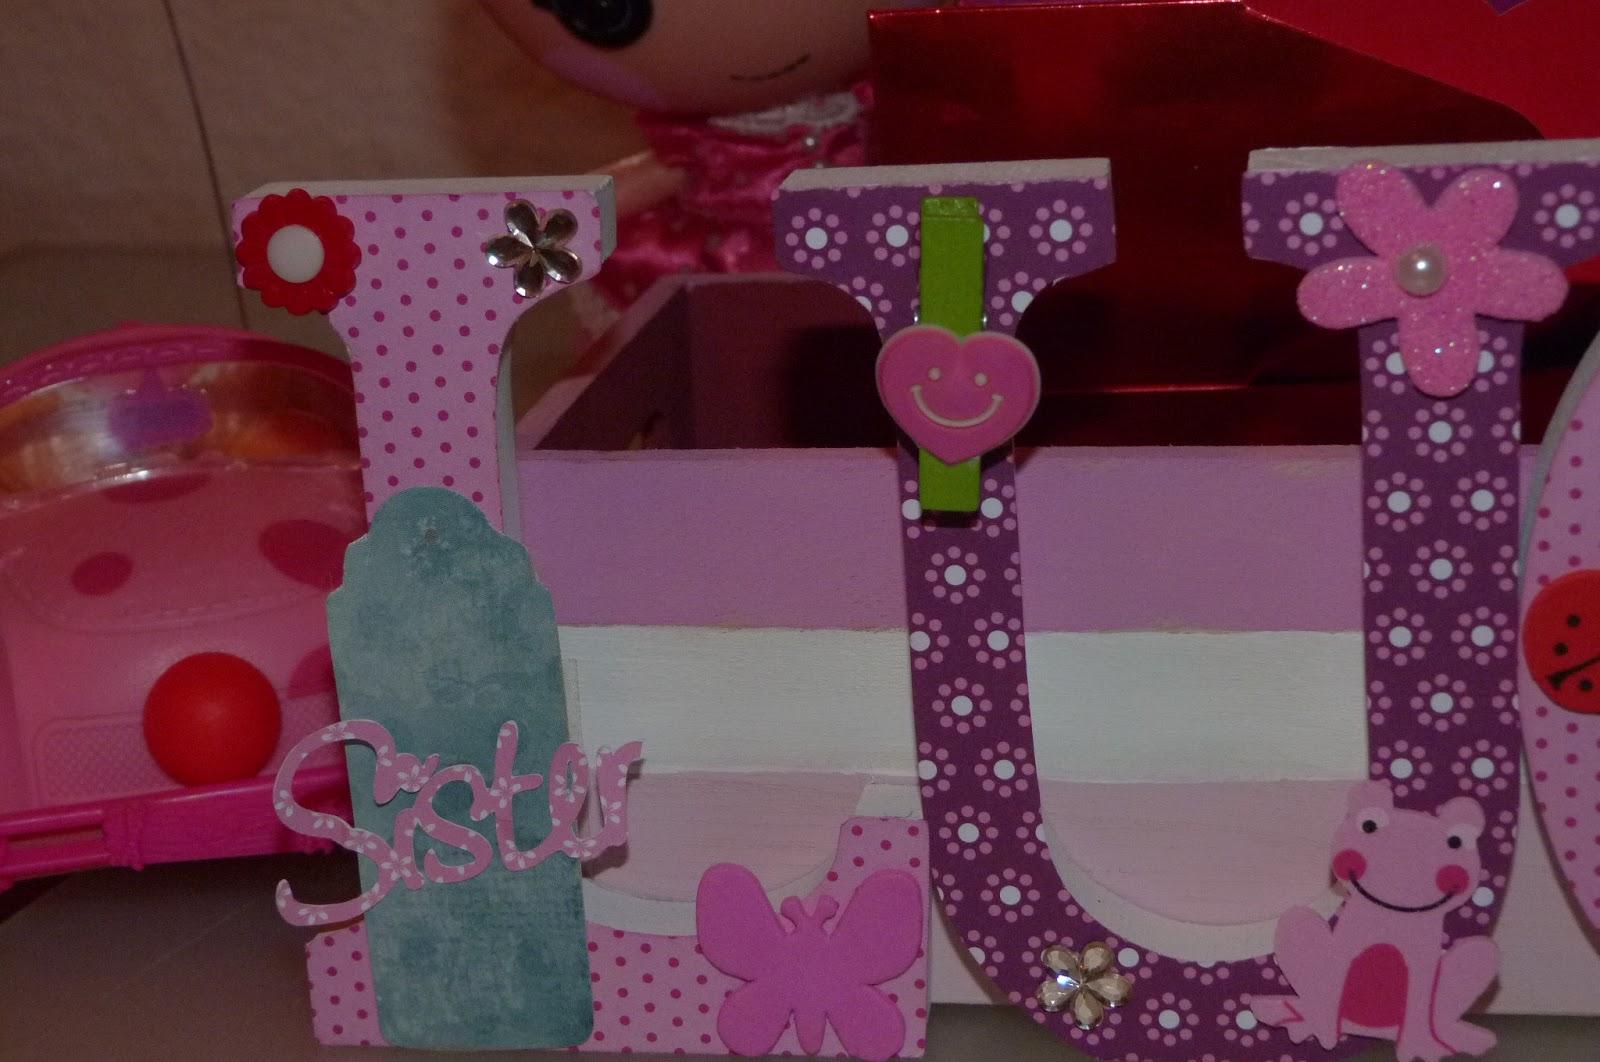 Mariposas de papel letras de madera decoradas for Cajas de carton pequenas decoradas